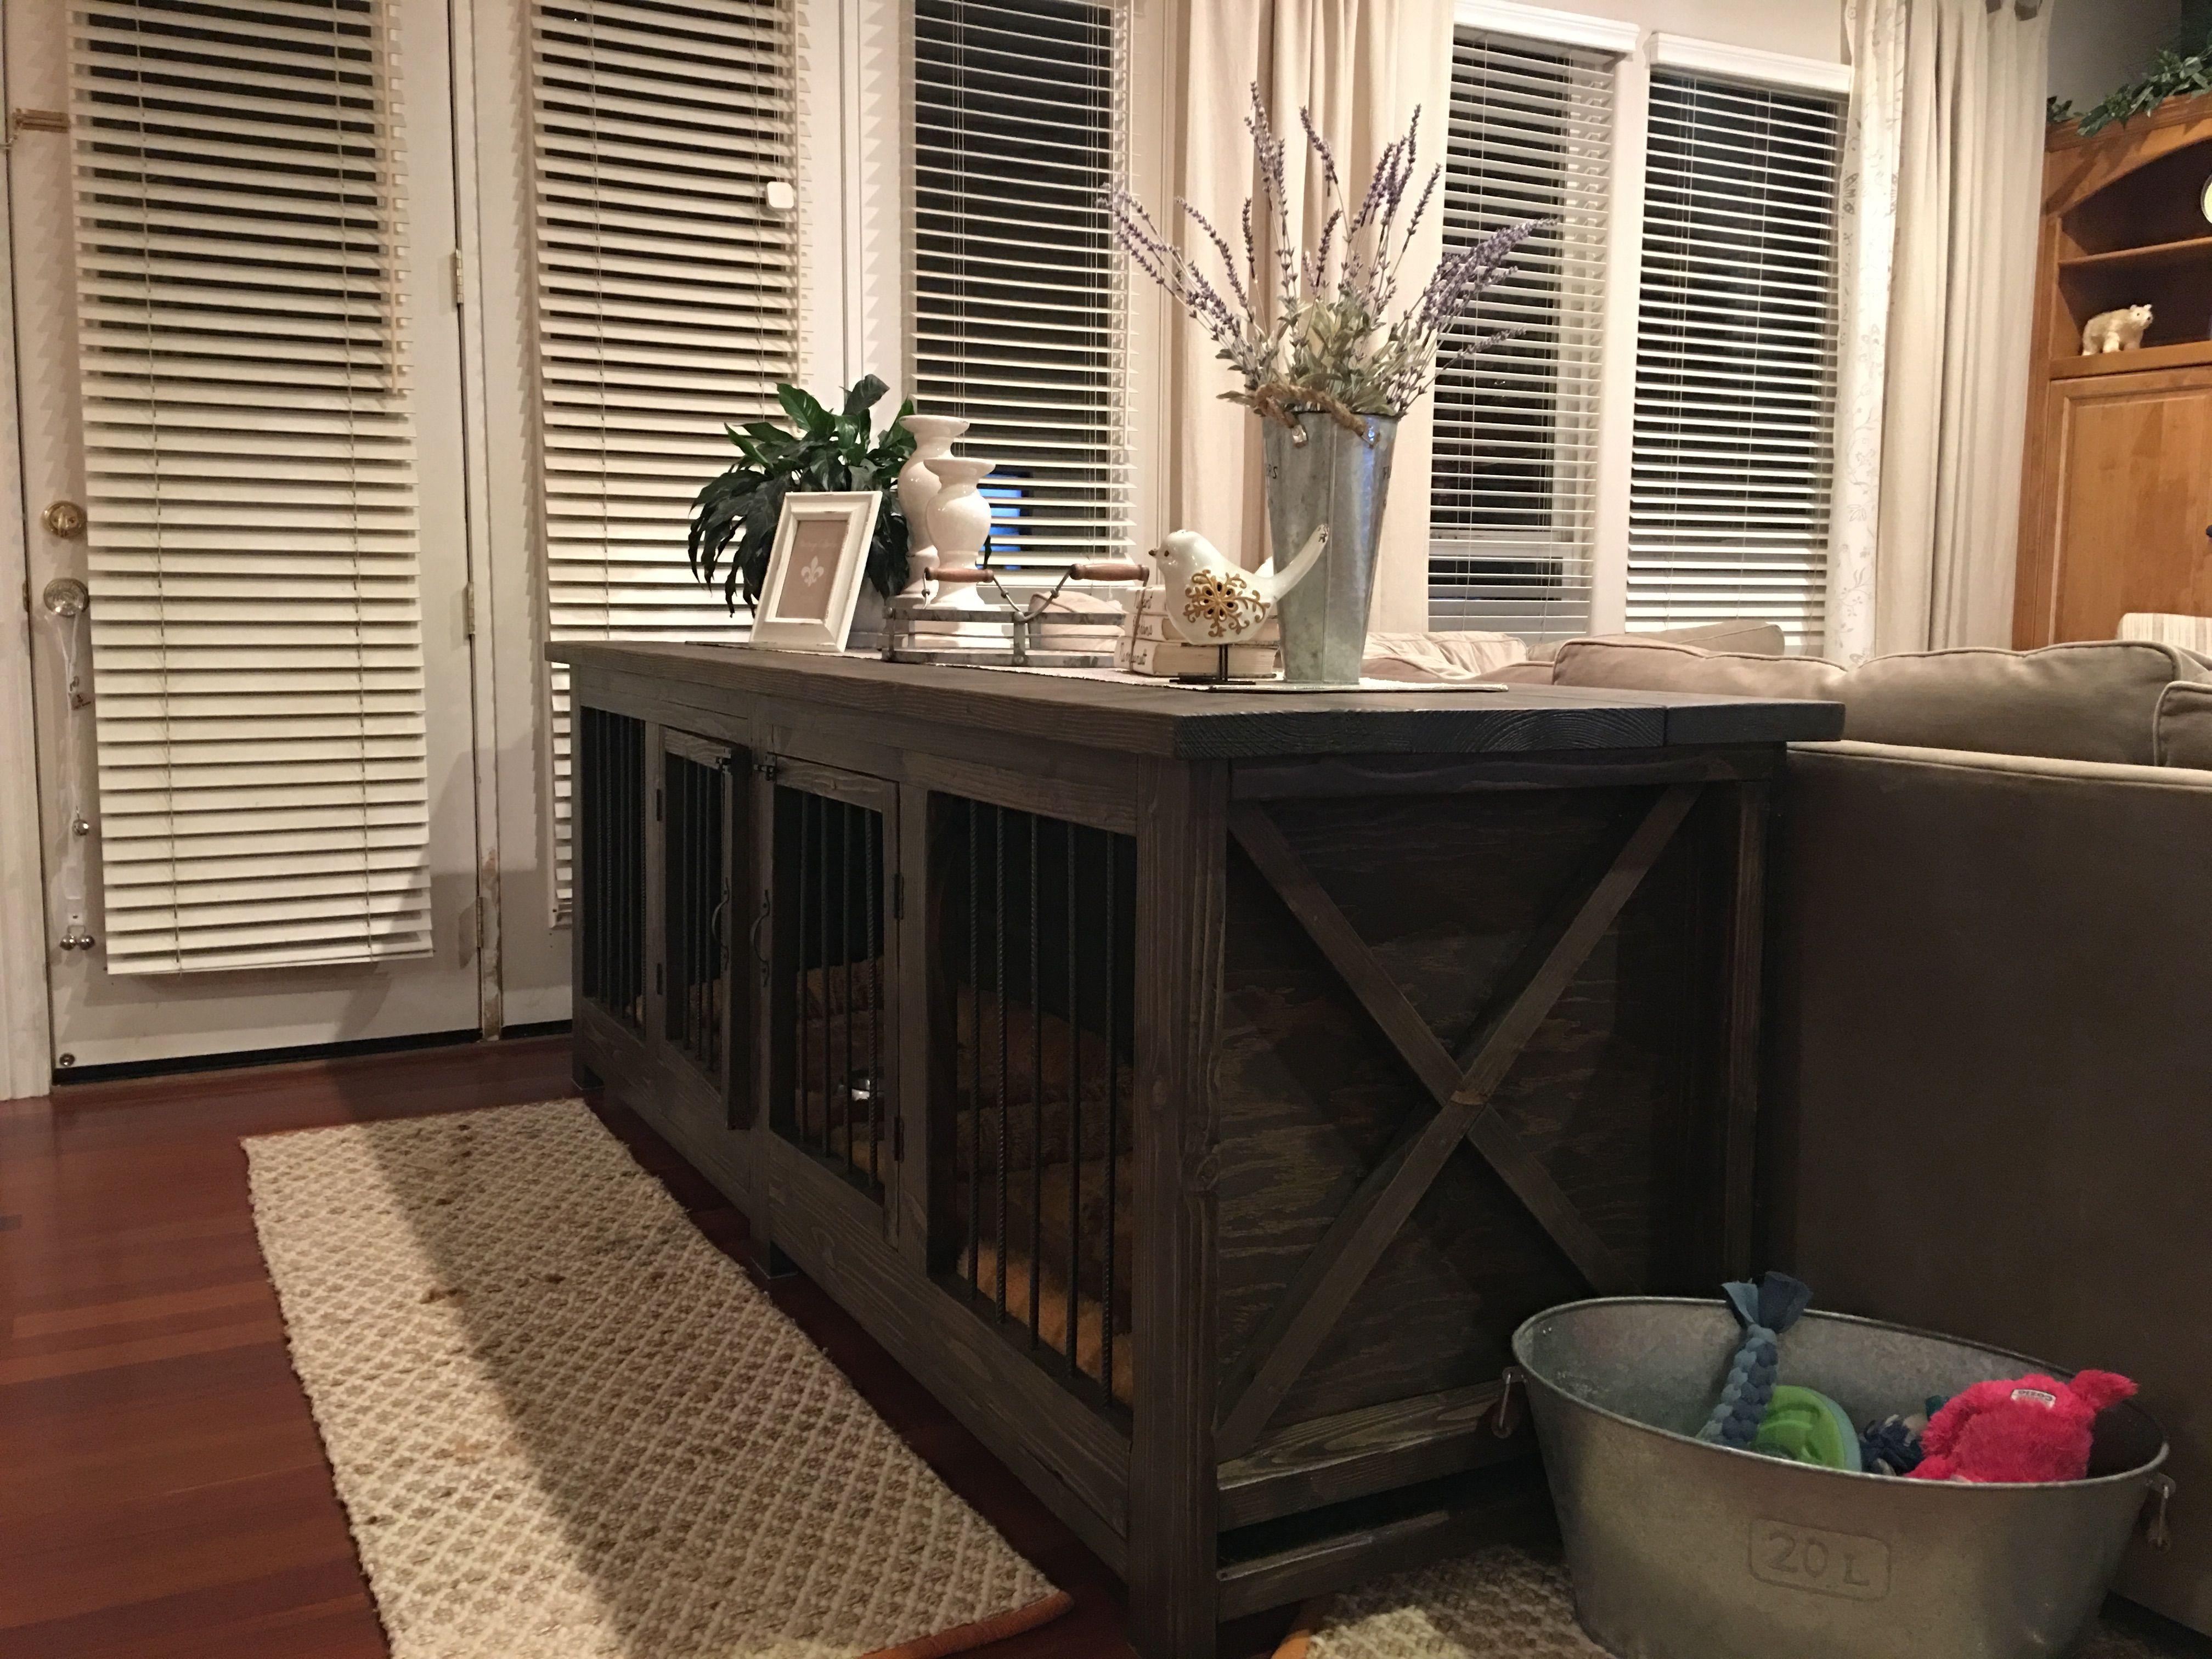 Farmhouse Dog Crate Sofa Table Don T Like Metal Dog Crates